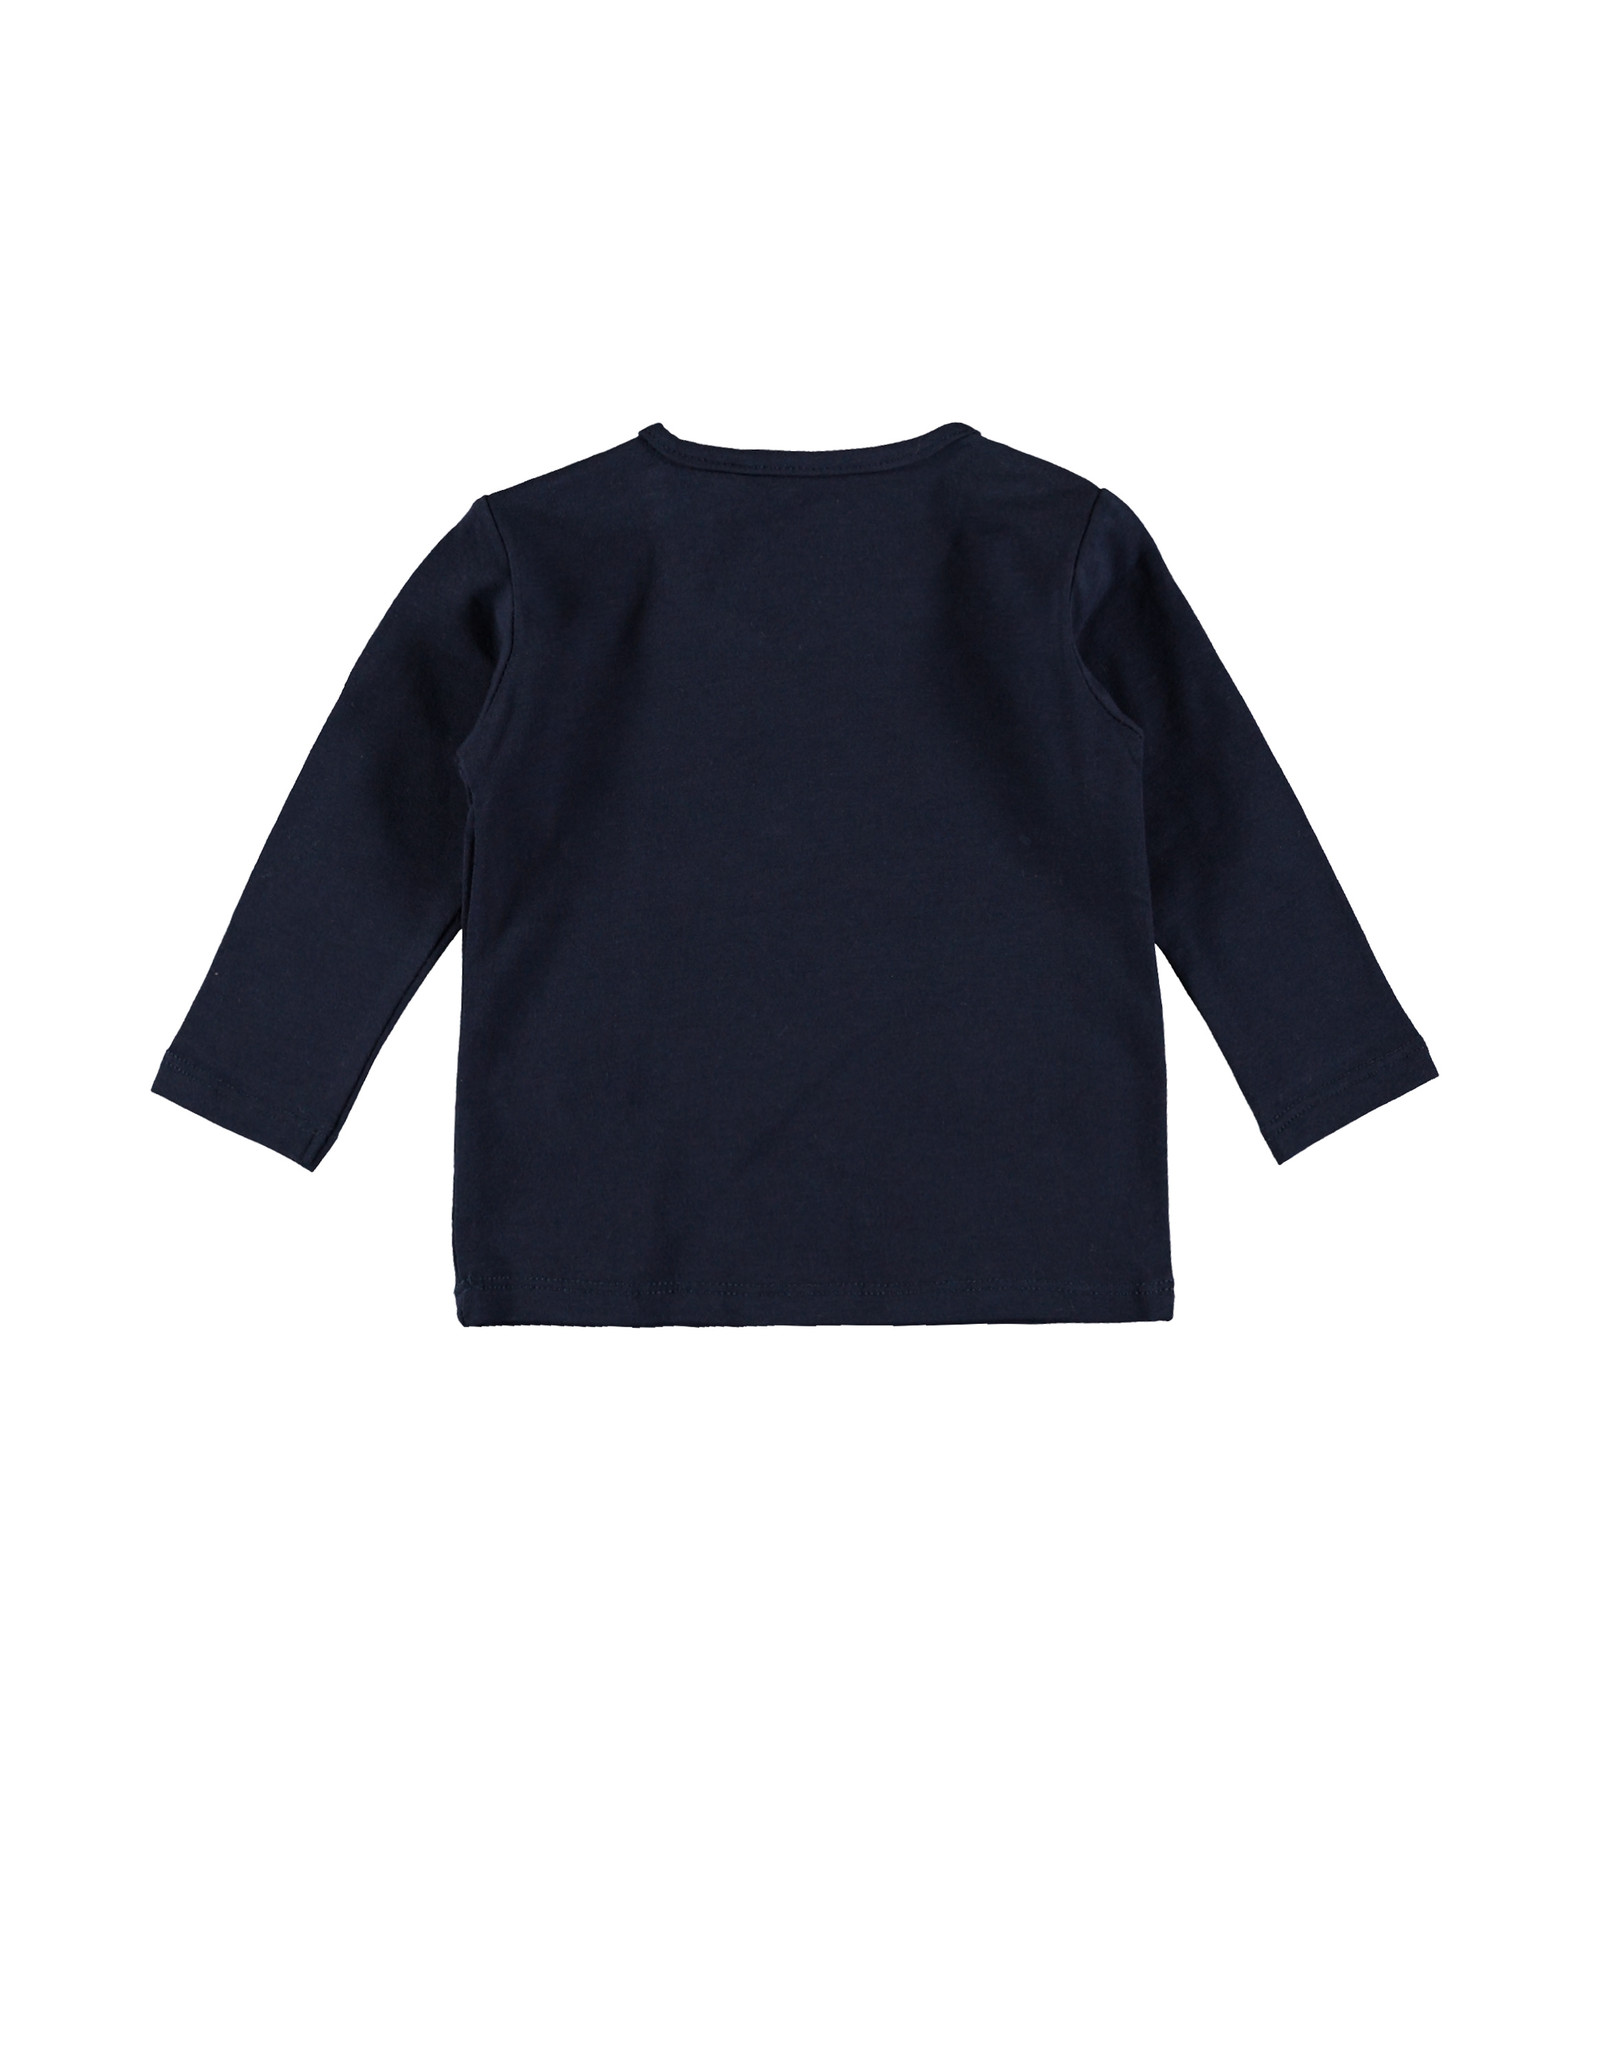 Bampidano New Born T-shirt l/s plain 100% LOVE / CUTEST SMILE / HUG ME!, navy